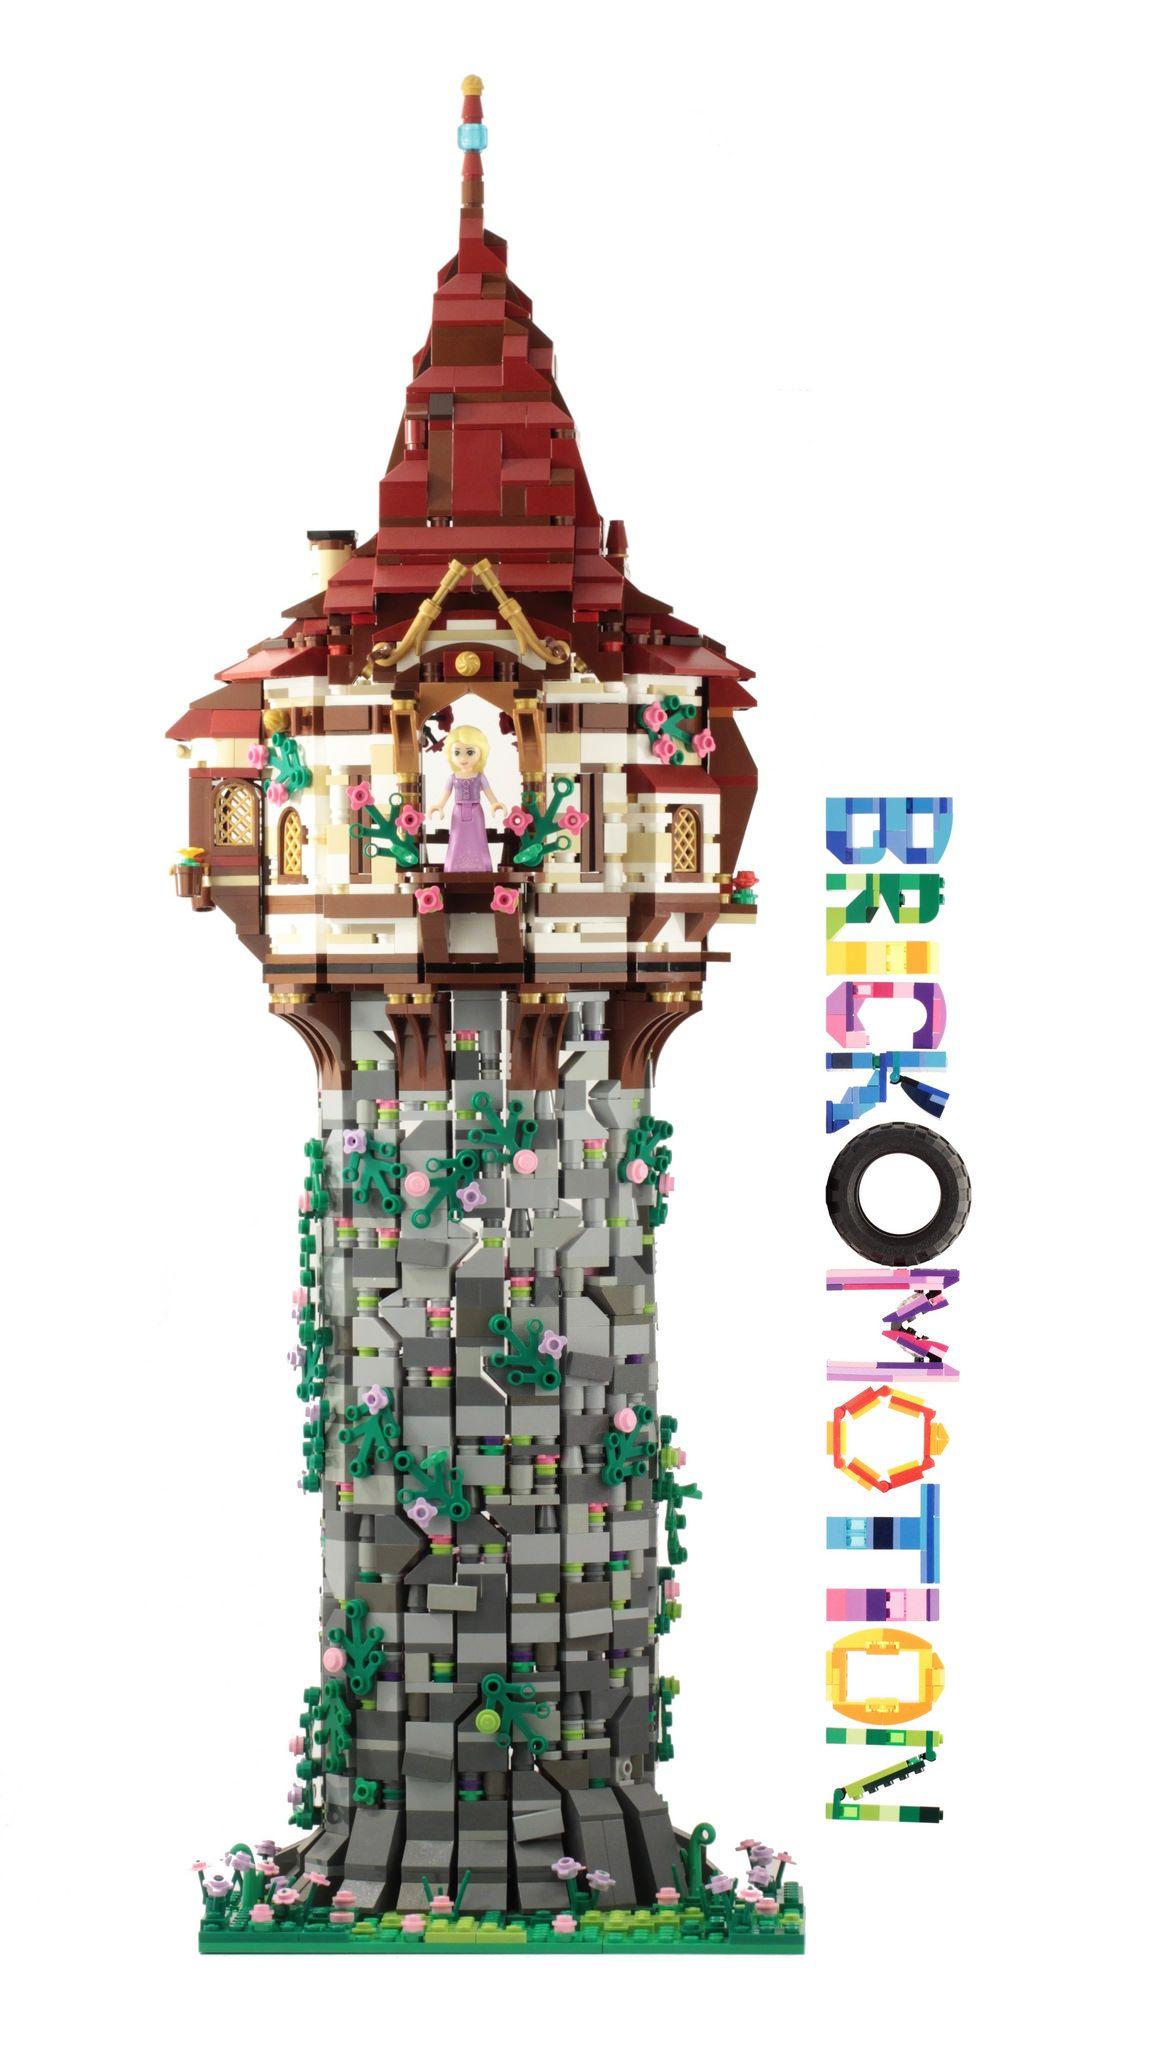 Towerfront Castles Rapunzel's Princesses SideDisney Lego NnwOPXk80